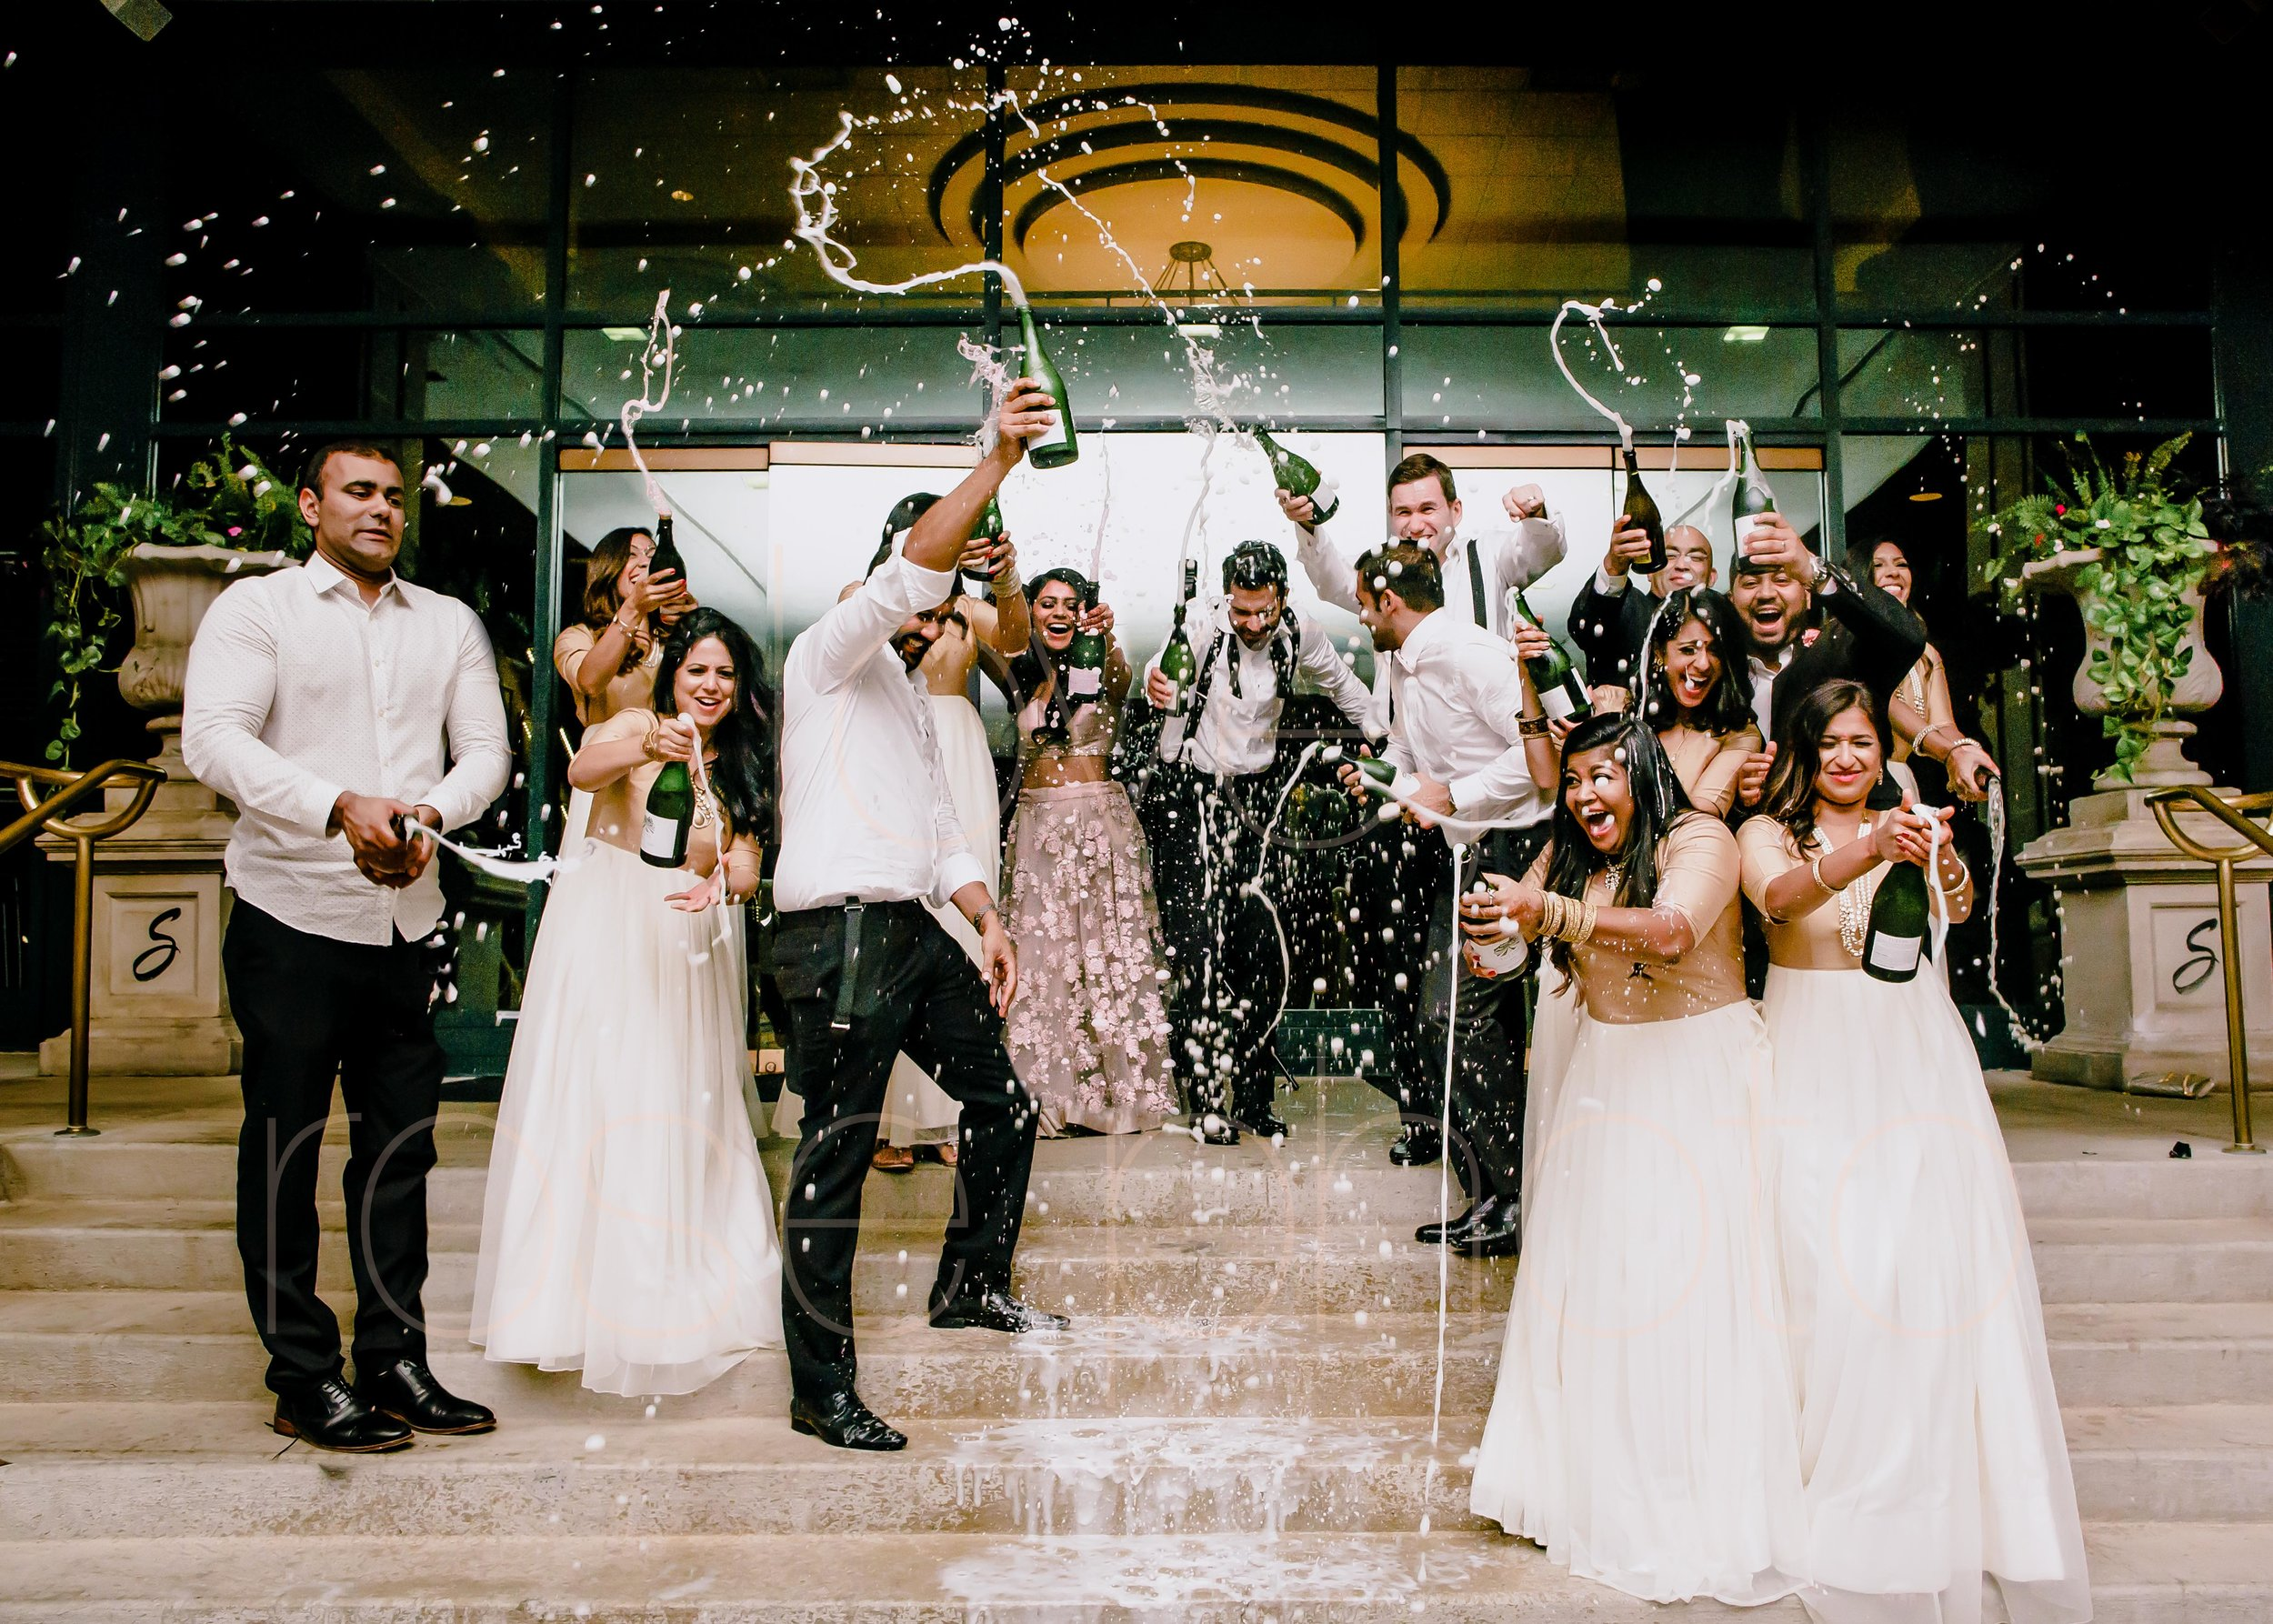 Chicago Indian Wedding best photography lifestyle wedding portrait luxury wedding-79.jpg